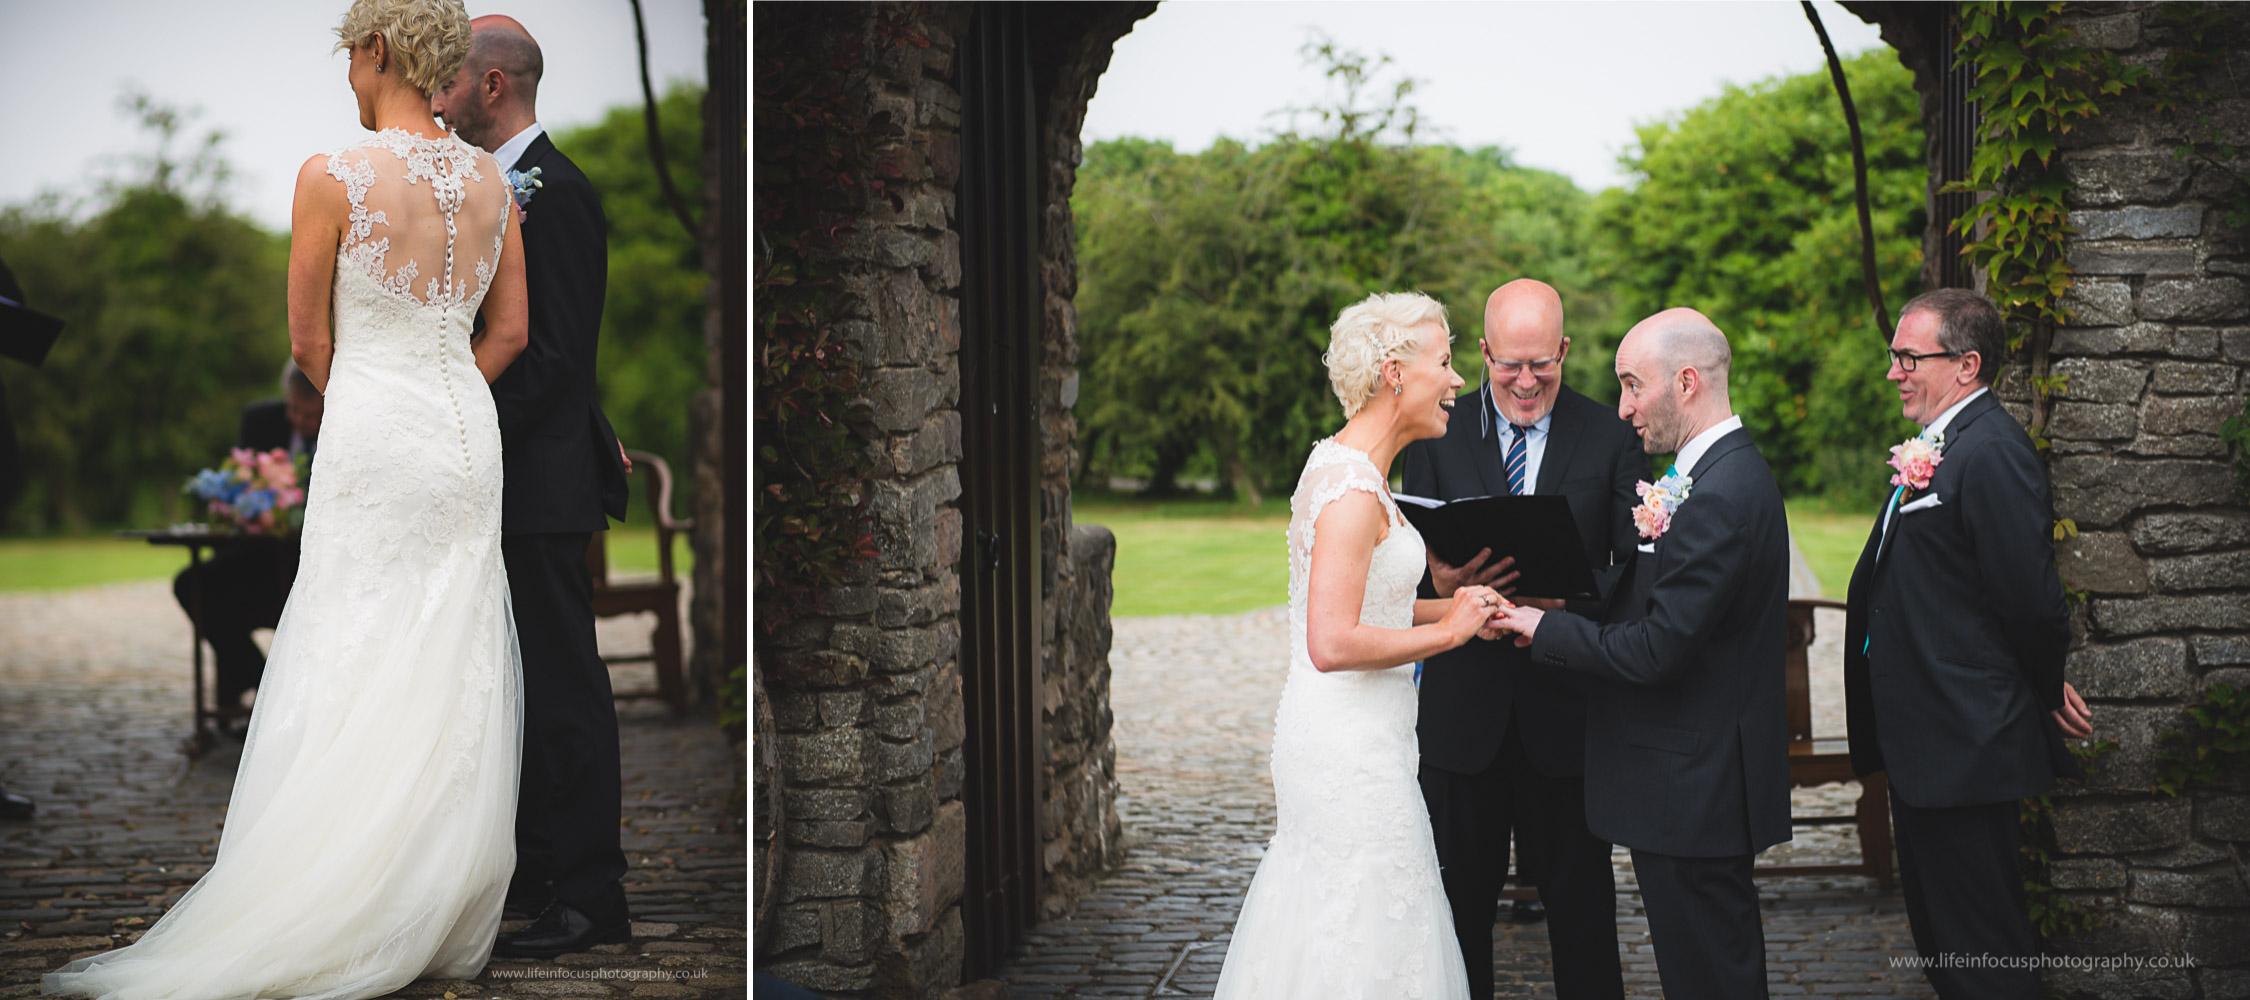 castle-wedding-venue-somerset.jpg